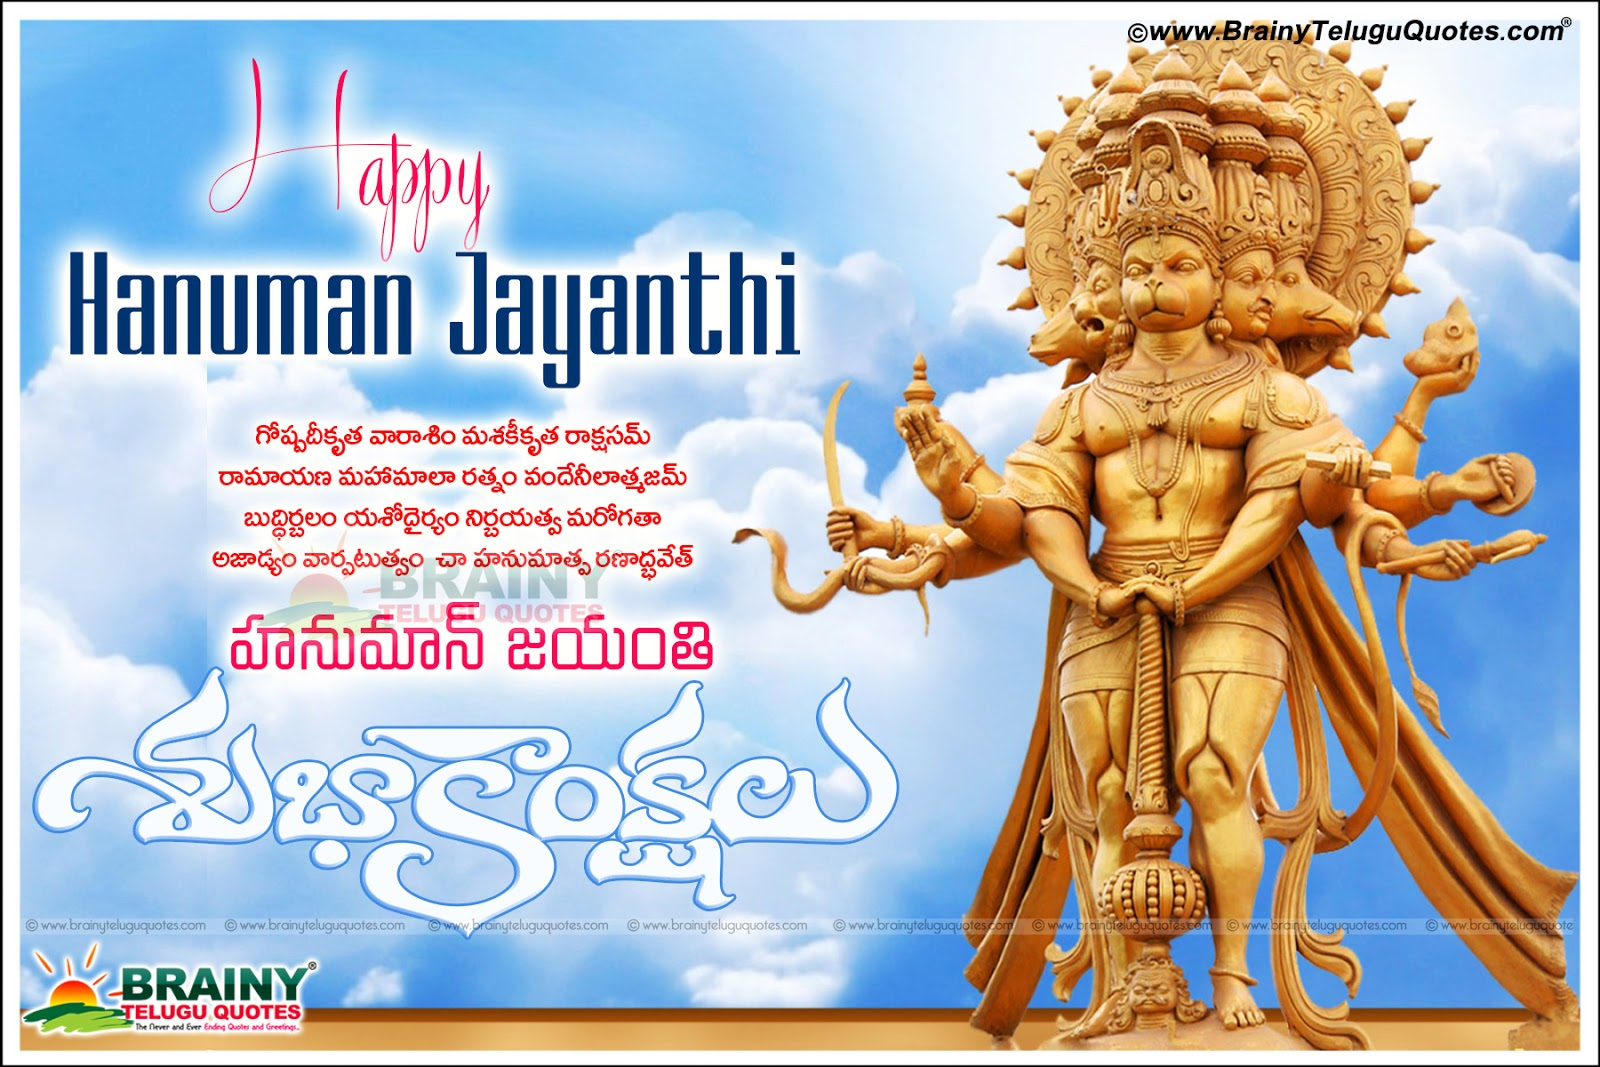 Happy Hanuman Jayanti Wishes In Hindi Hanuman Jayanti Sms 3132513